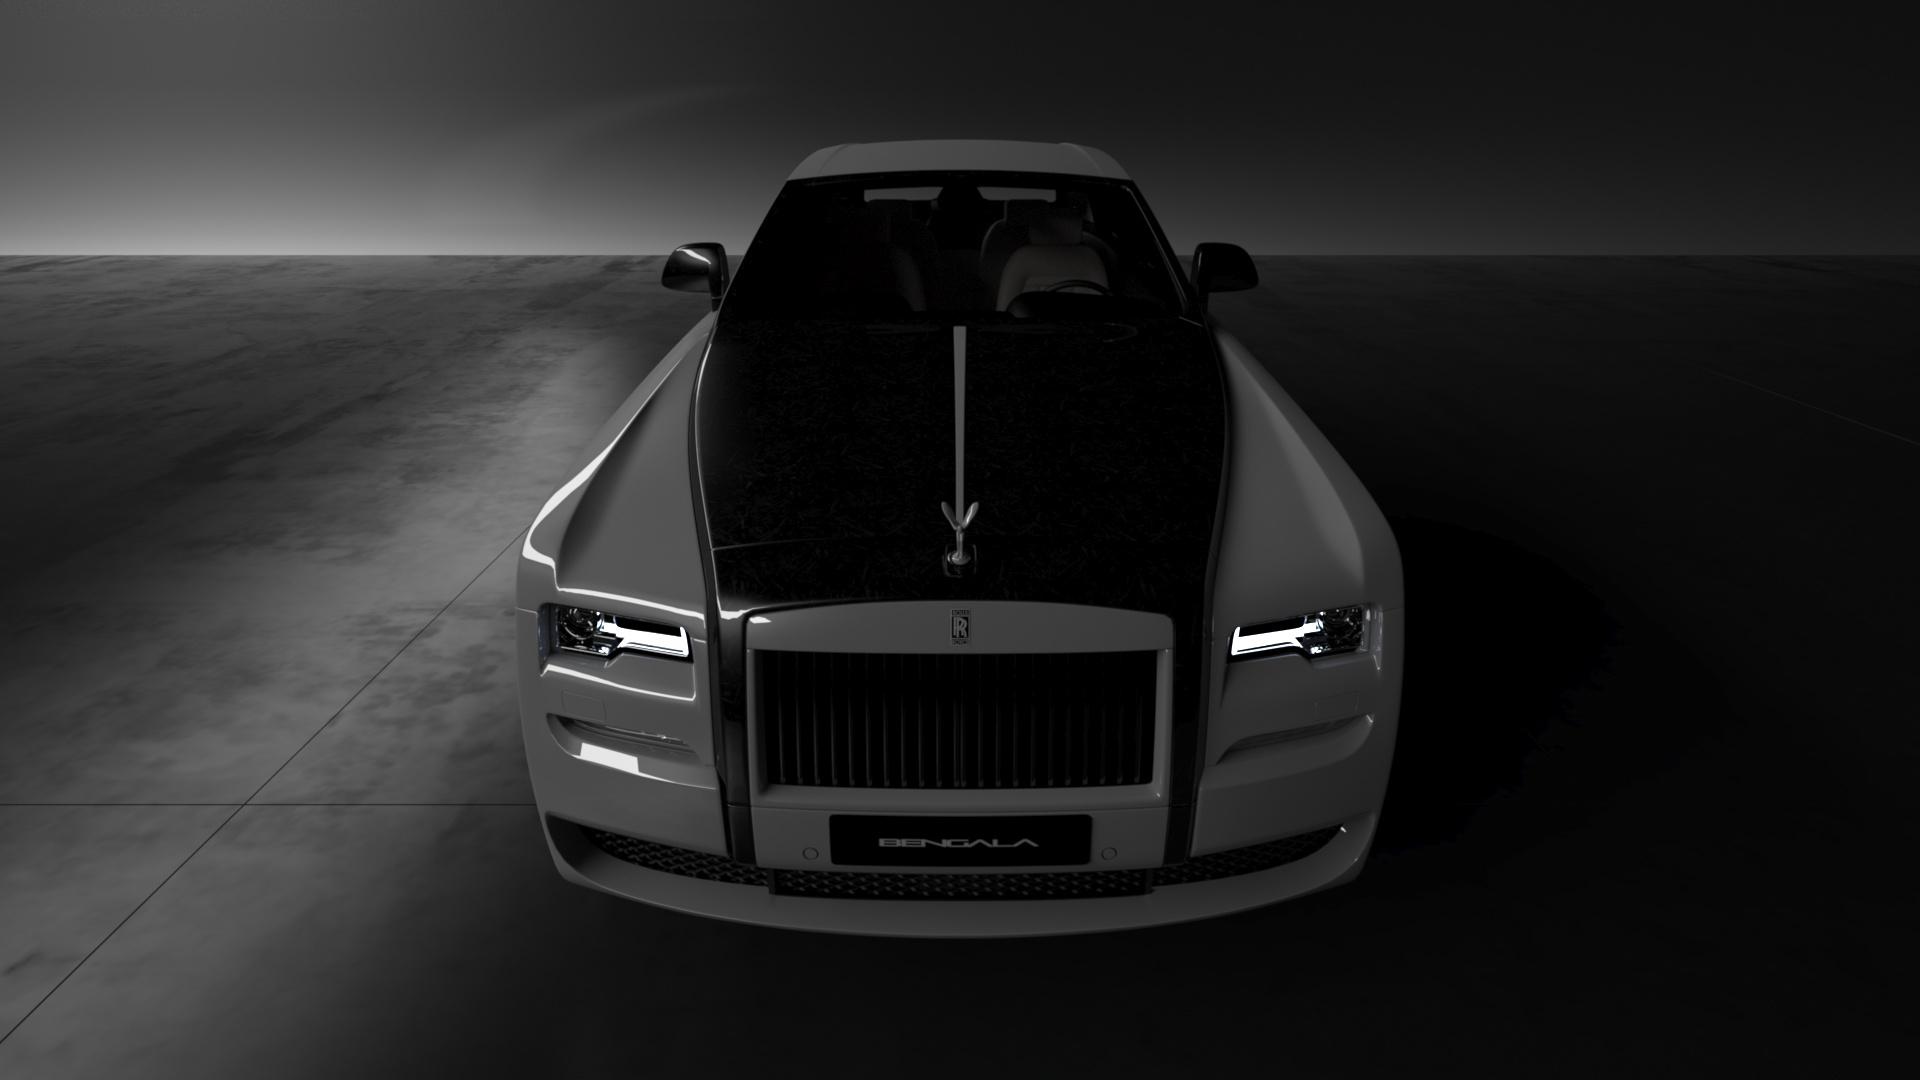 Bengala Automotive Vitesse Audessus Dress Up Rolls Royces In